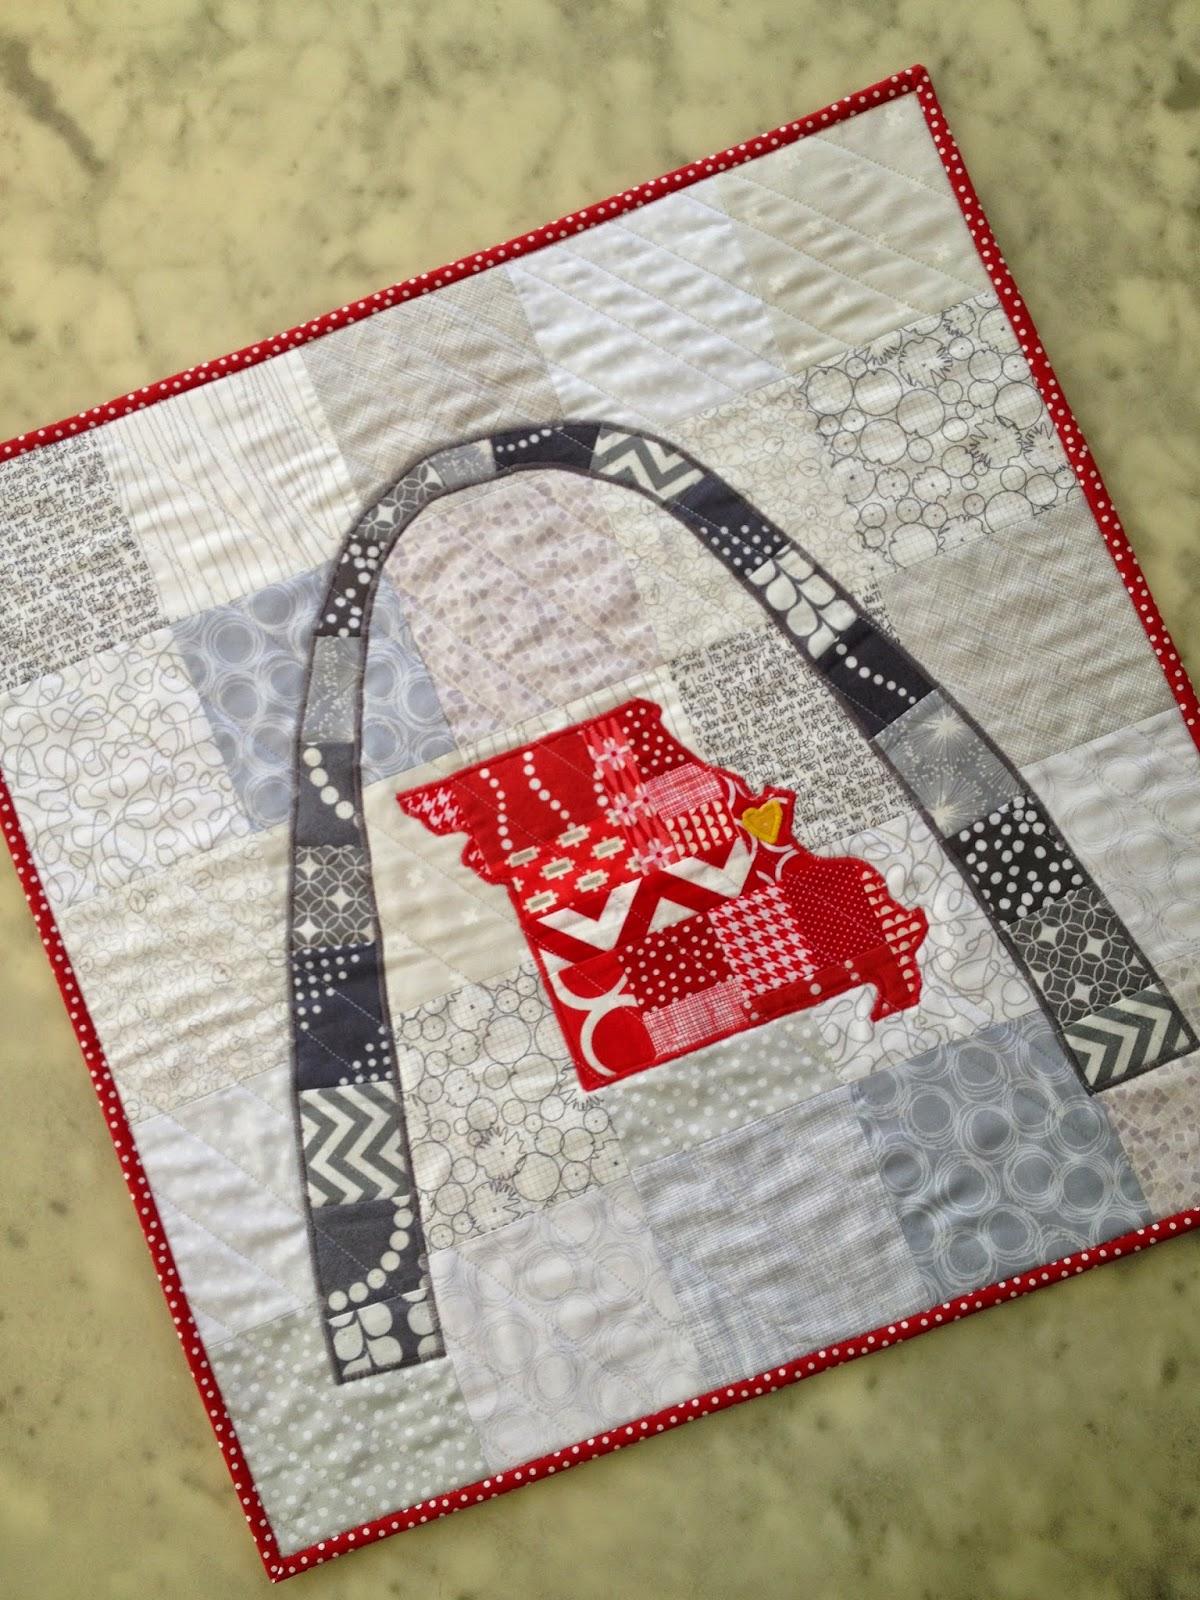 http://ablueskykindoflife.blogspot.com/2014/09/i-stl-mini-quilt.html